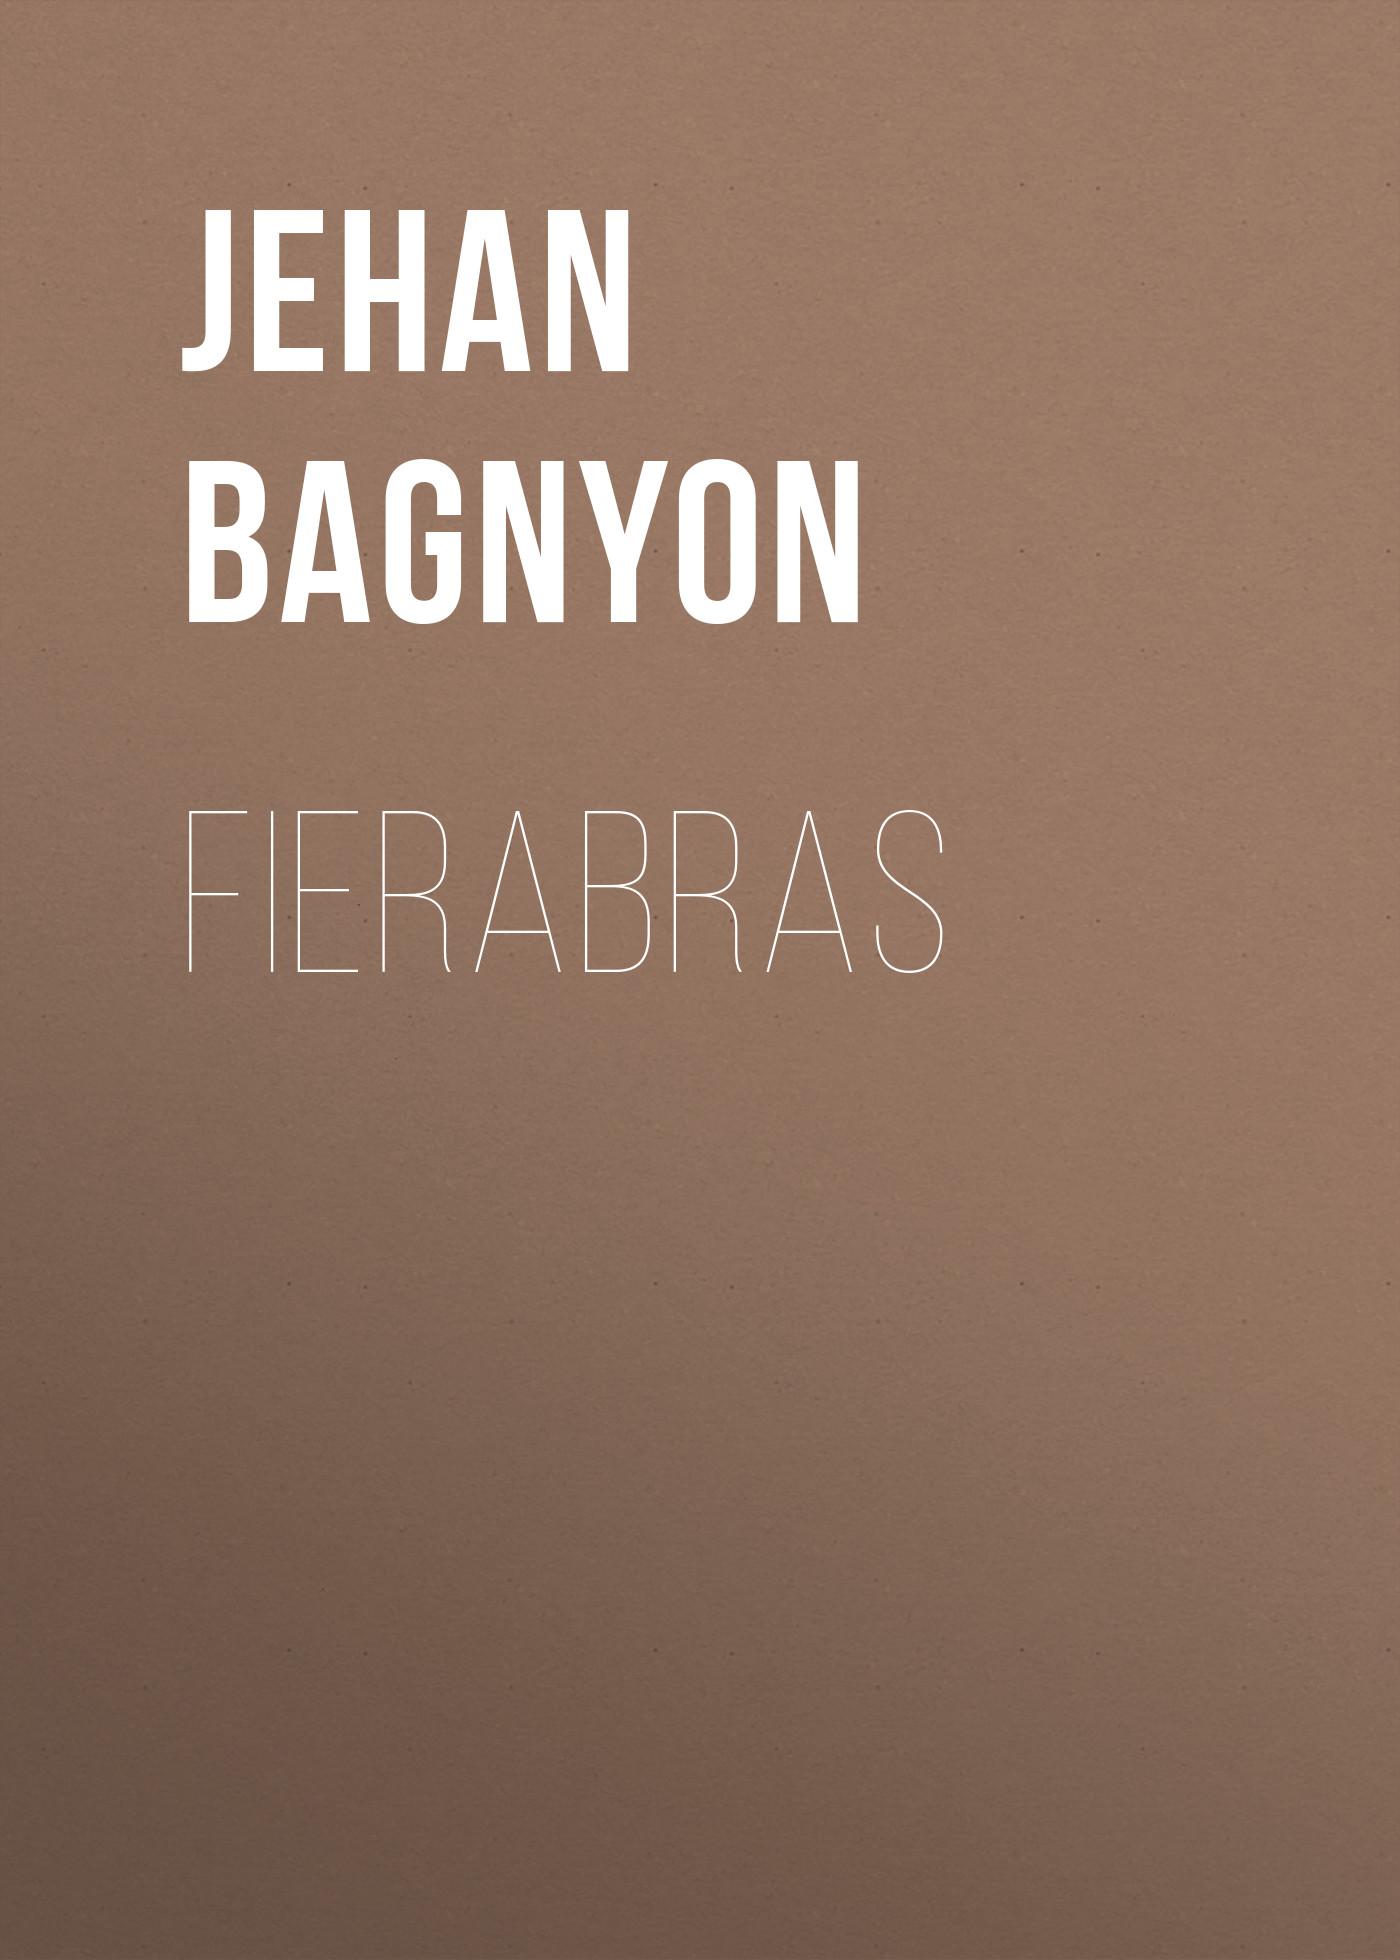 где купить Bagnyon Jehan Fierabras дешево